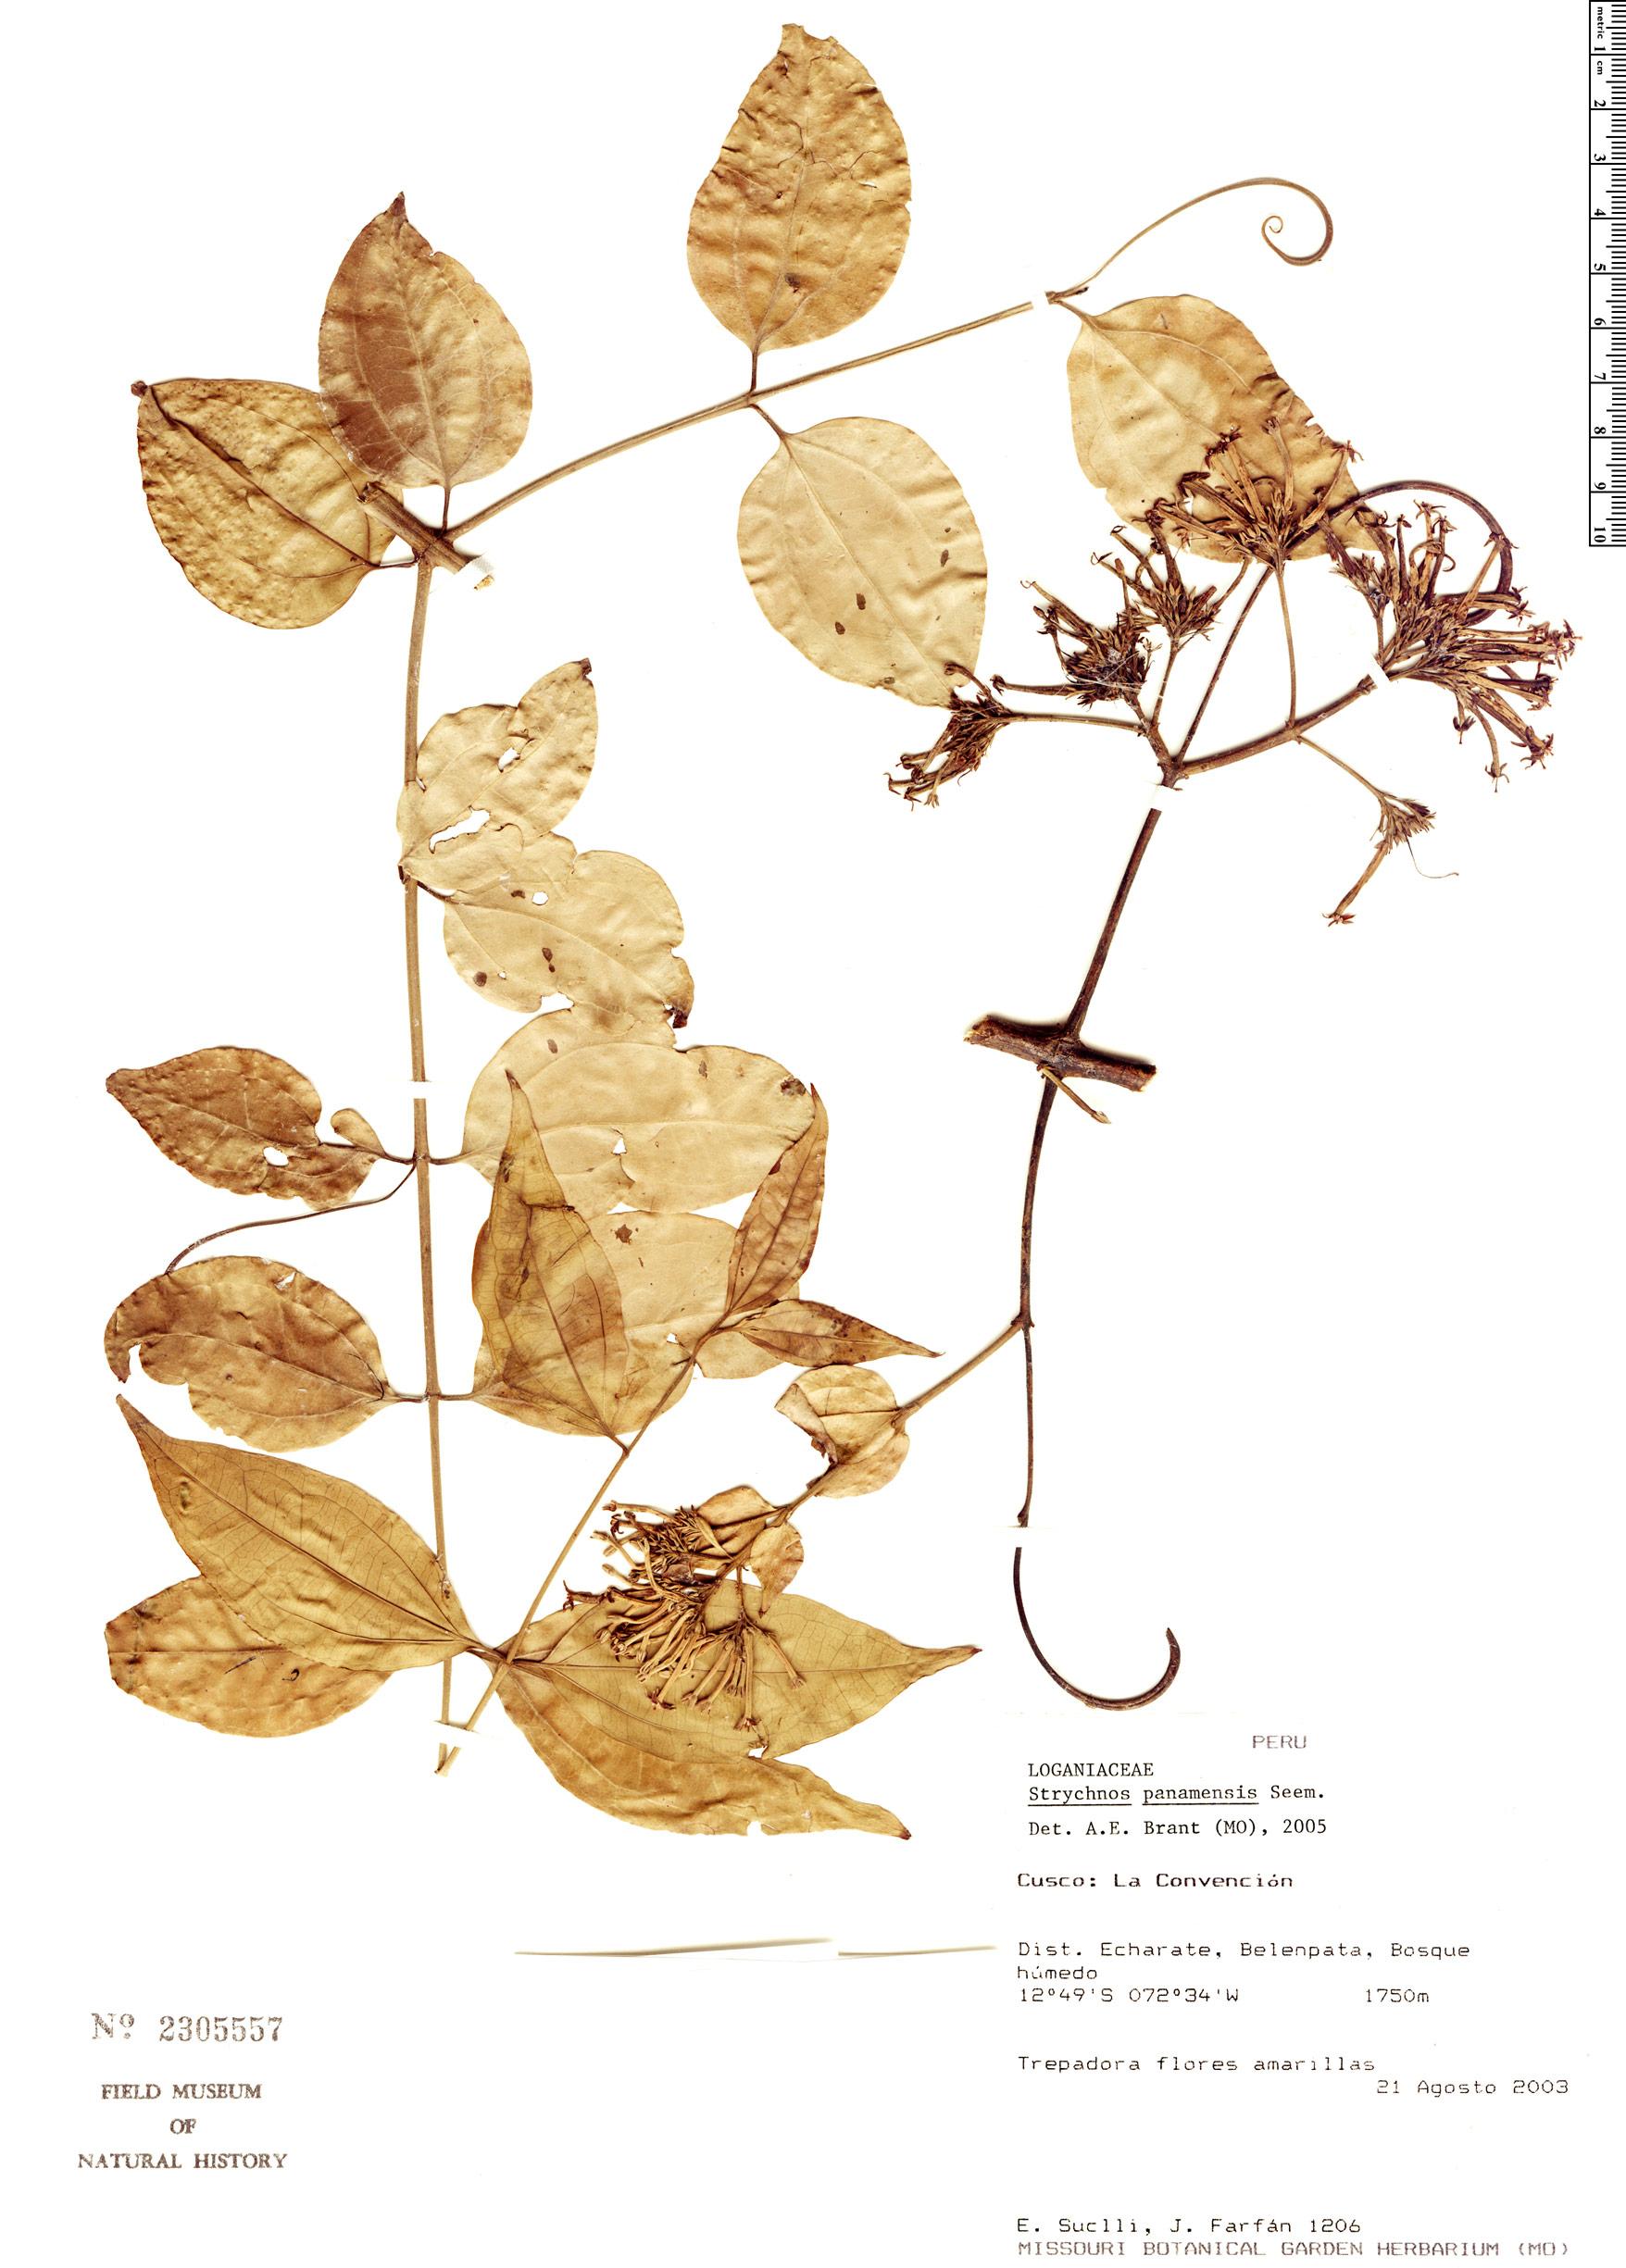 Espécimen: Strychnos panamensis